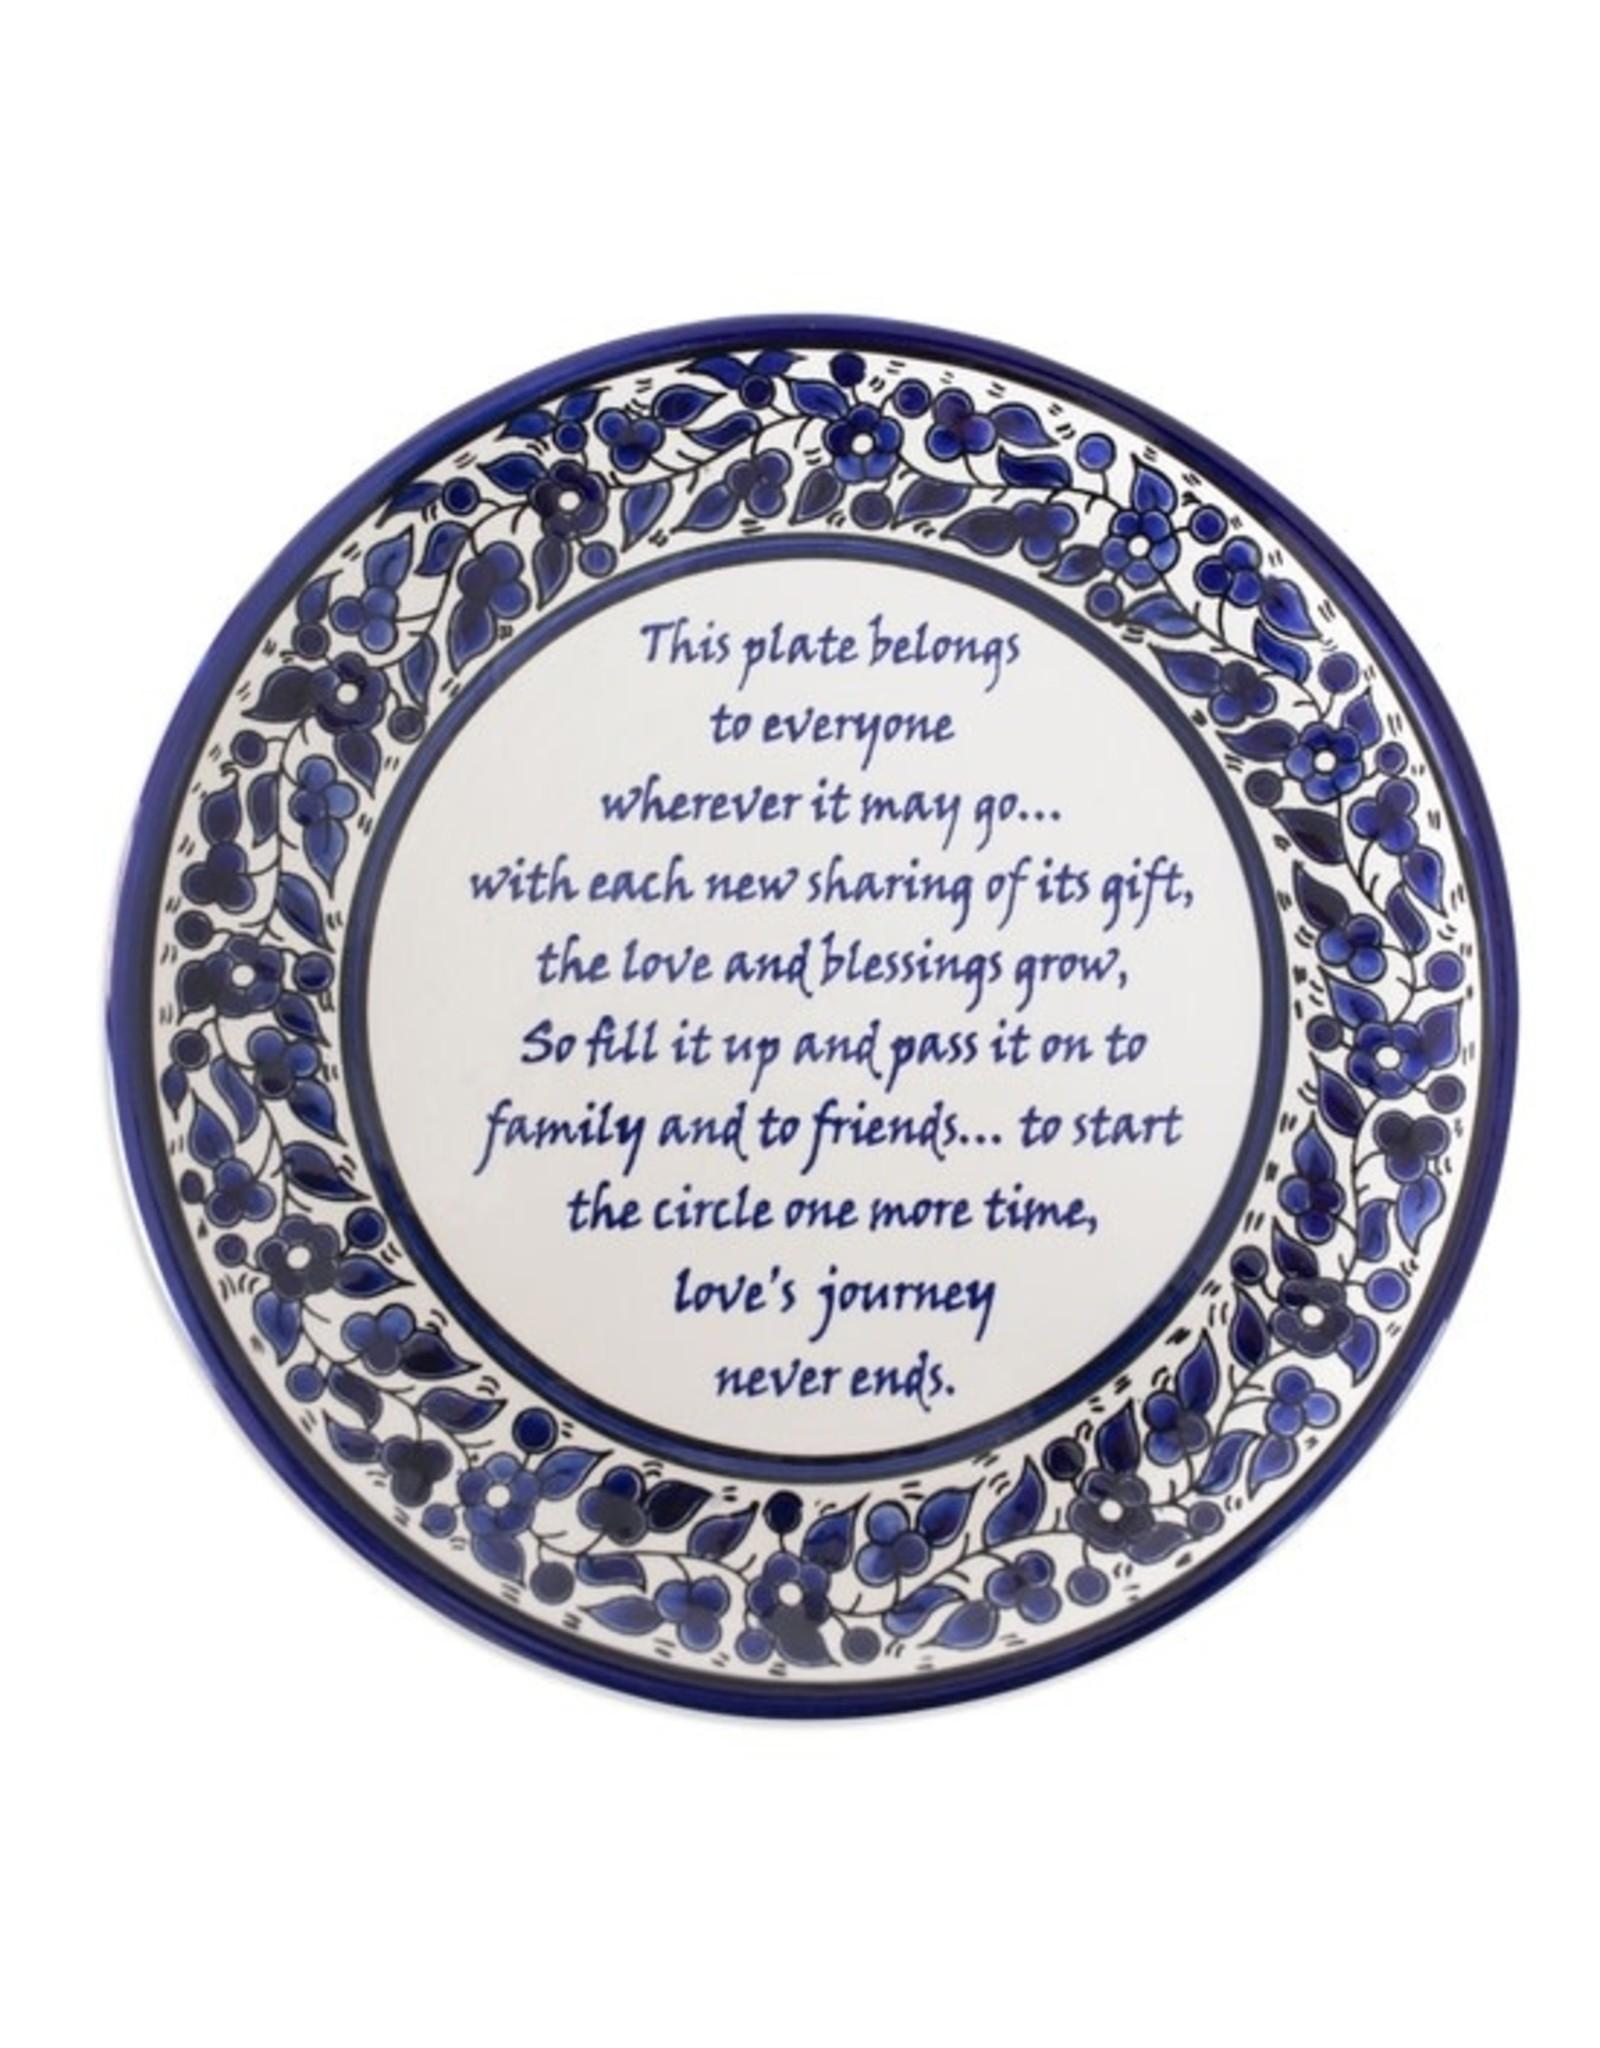 TTV USA Giving Plate, Palestine